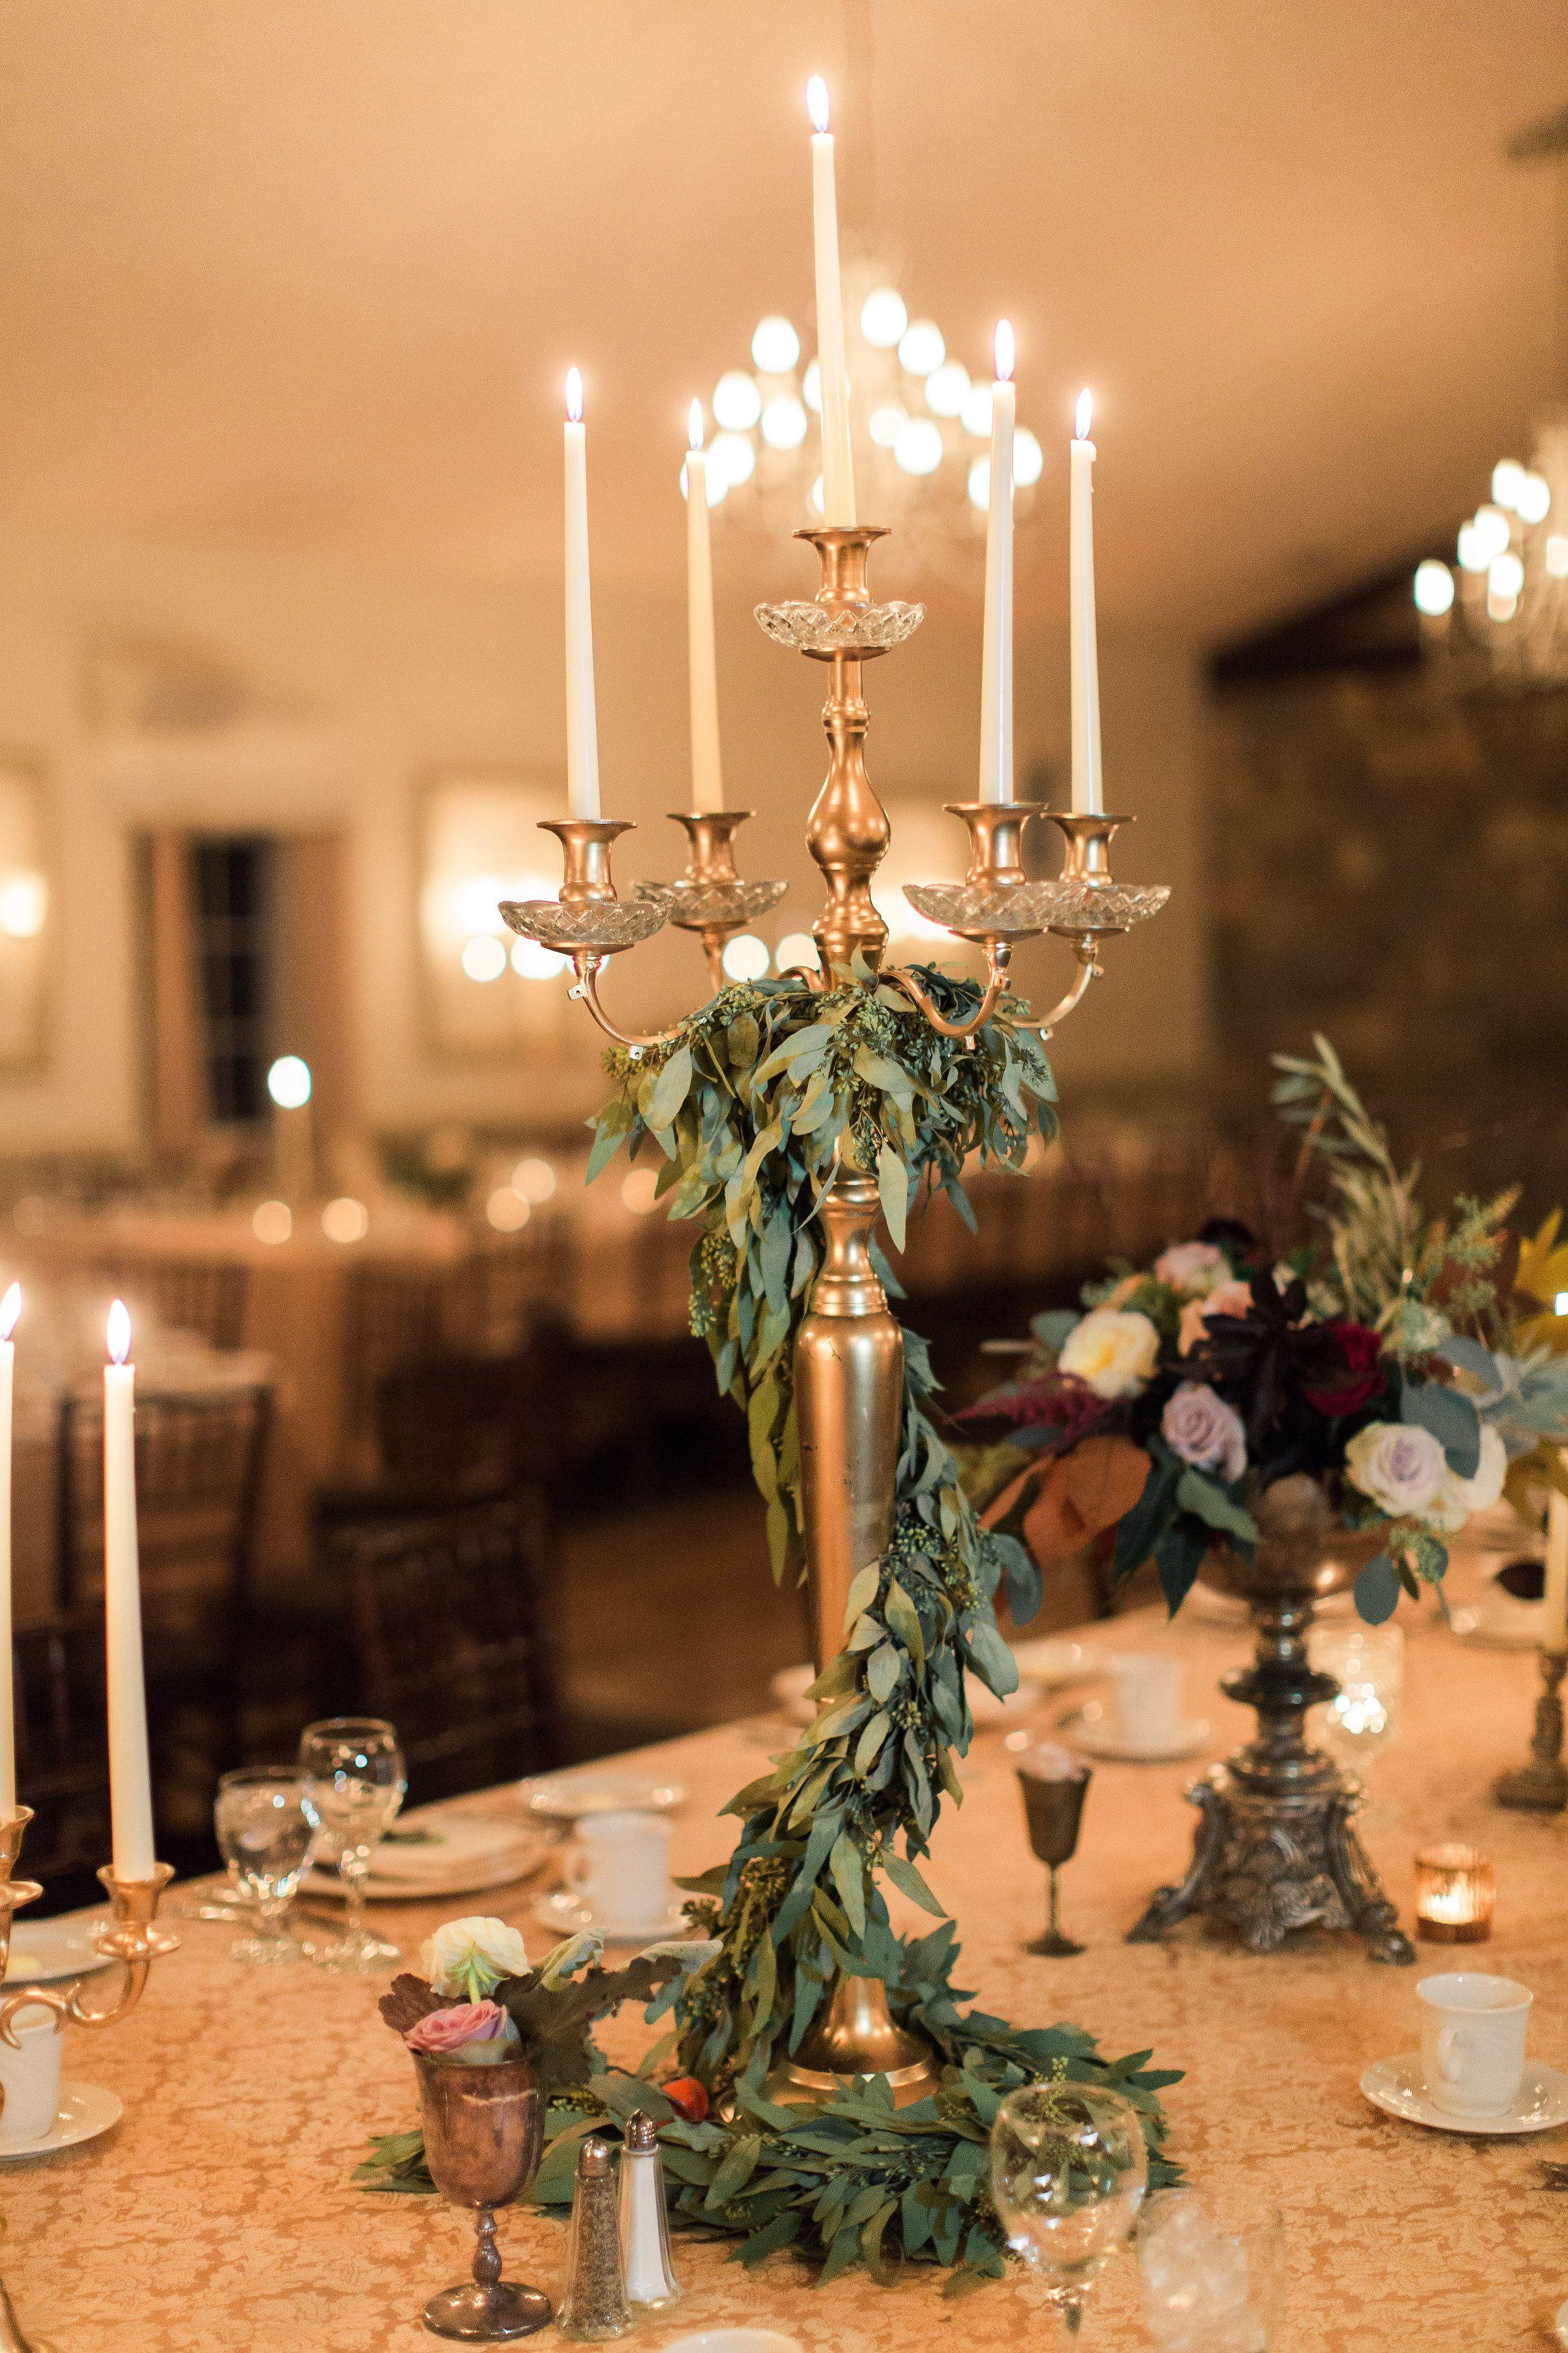 Romantic Candlelit Autumn Wedding Candelabra Wedding Centerpieces Christmas Wedding Centerpieces Candelabra Wedding